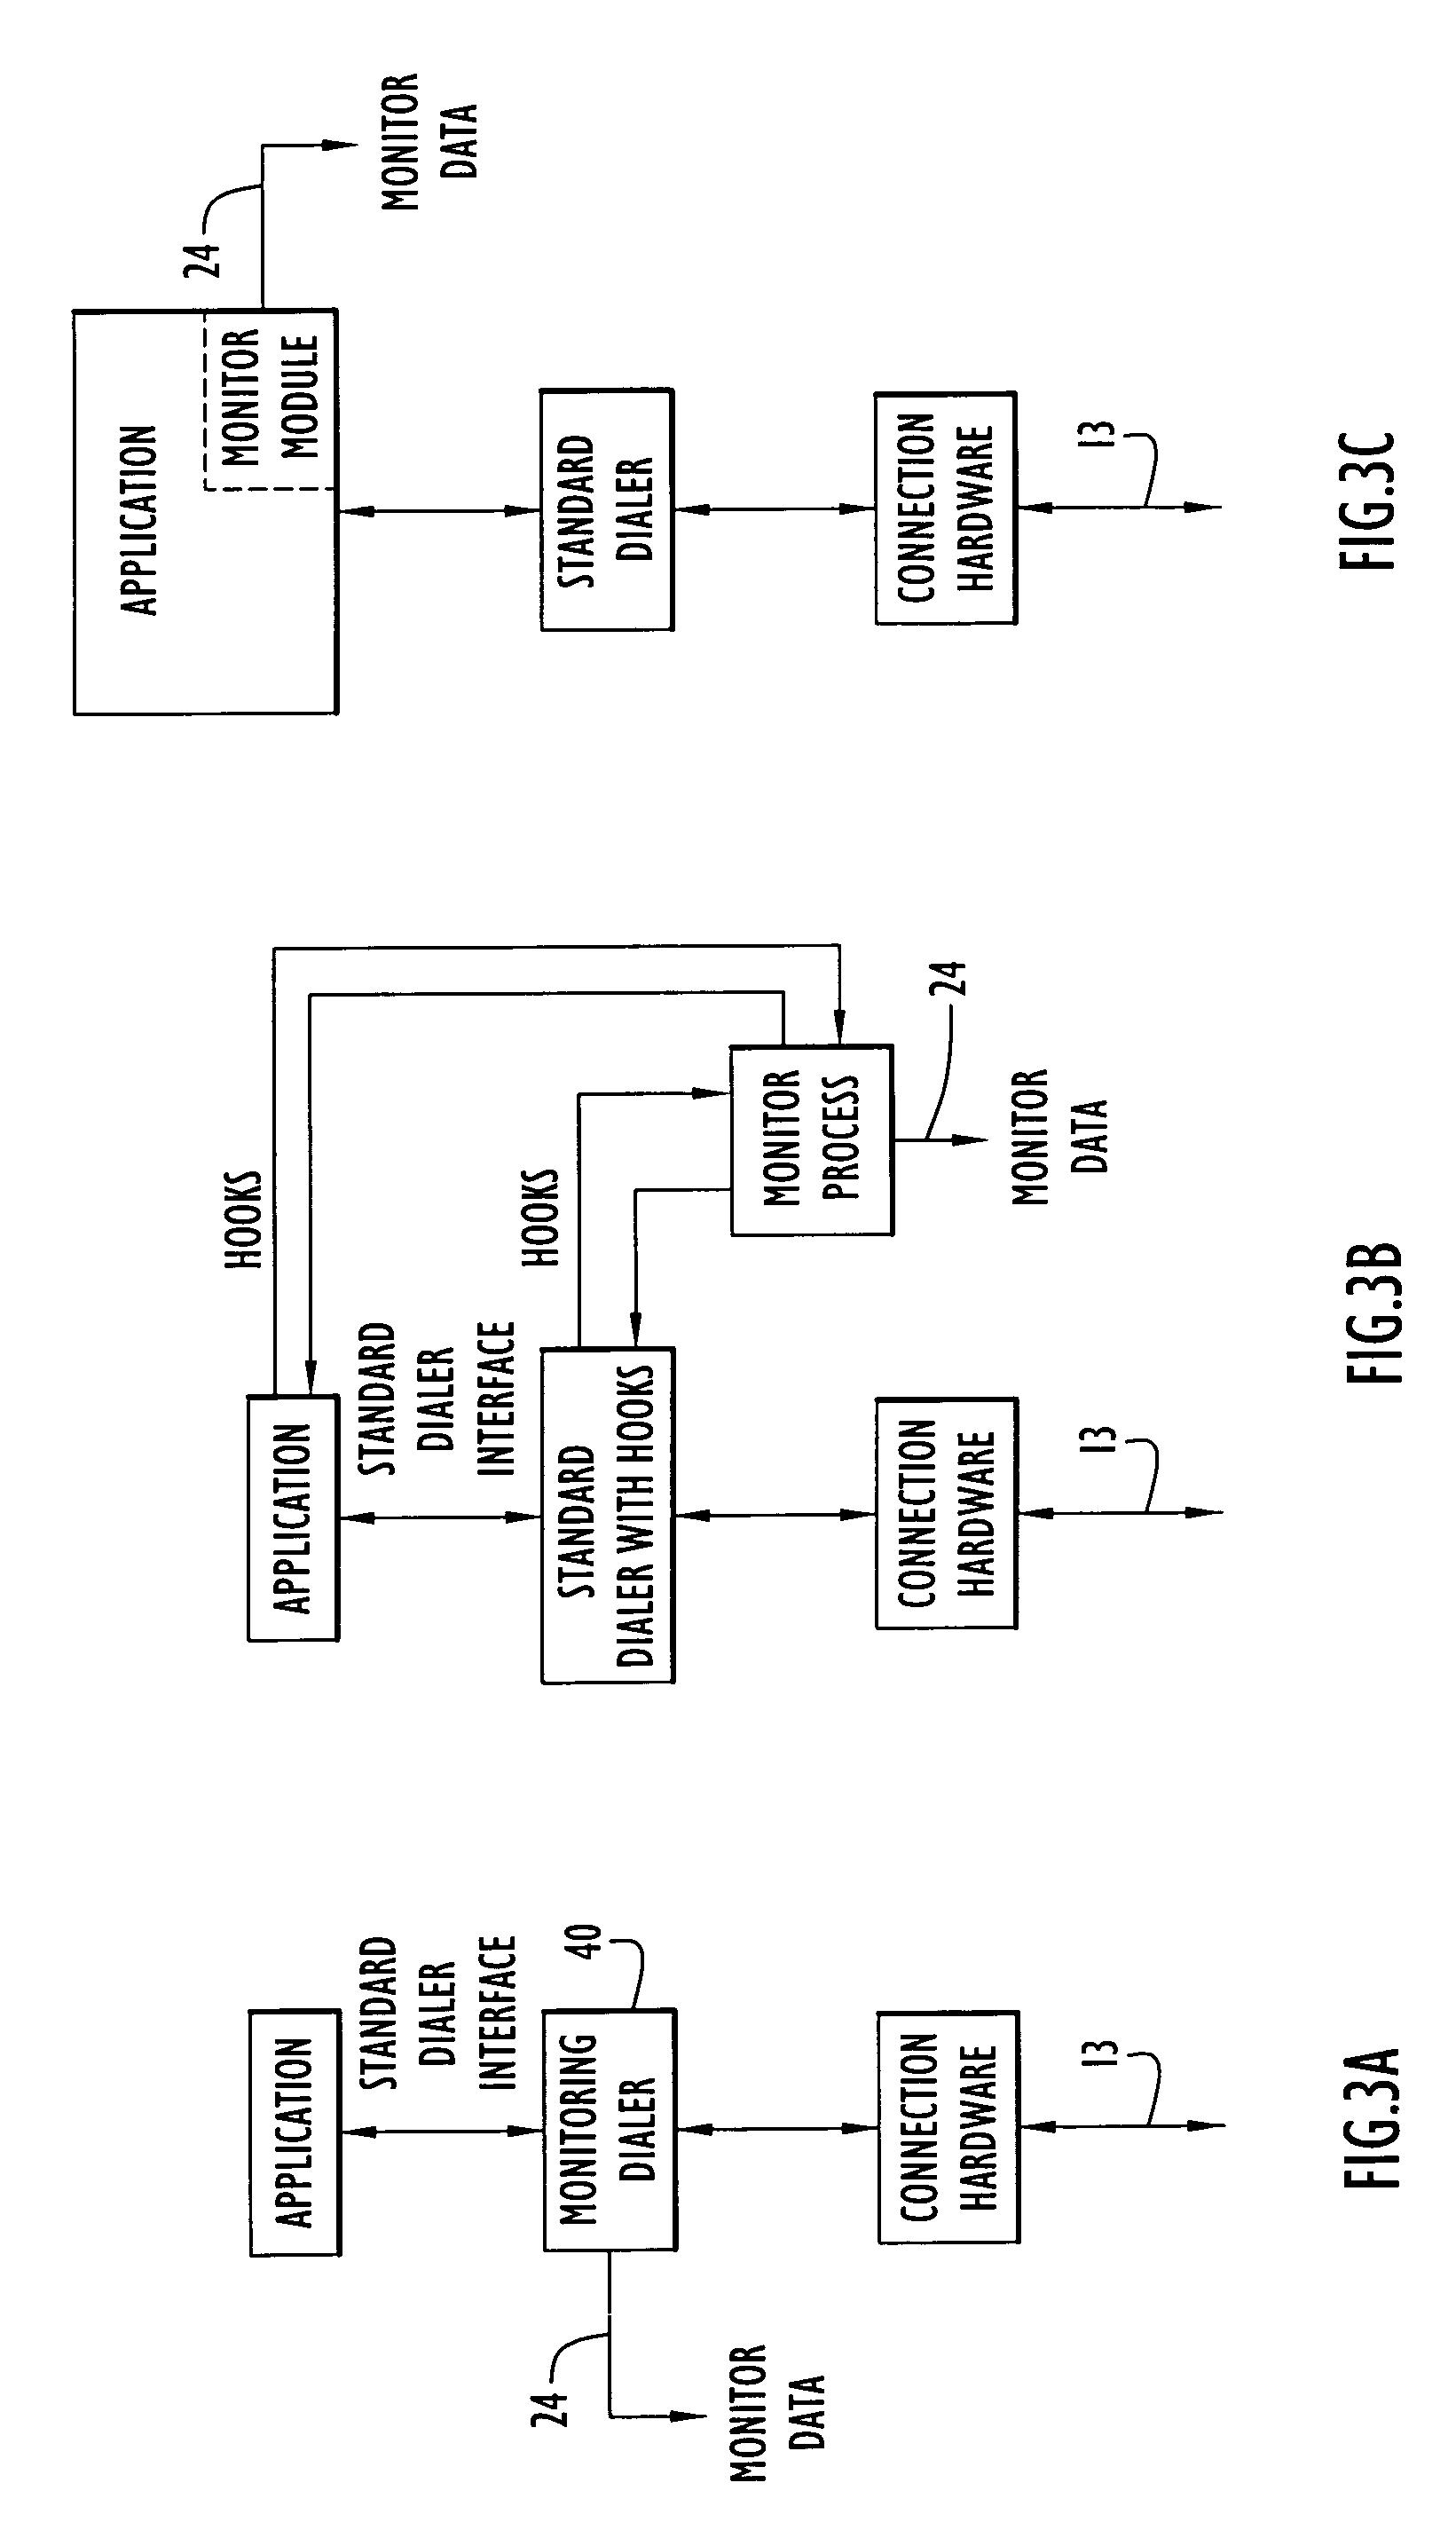 Patent Us 6970924 B1 Columbia Model 924 Wiring Diagram 0 Petitions